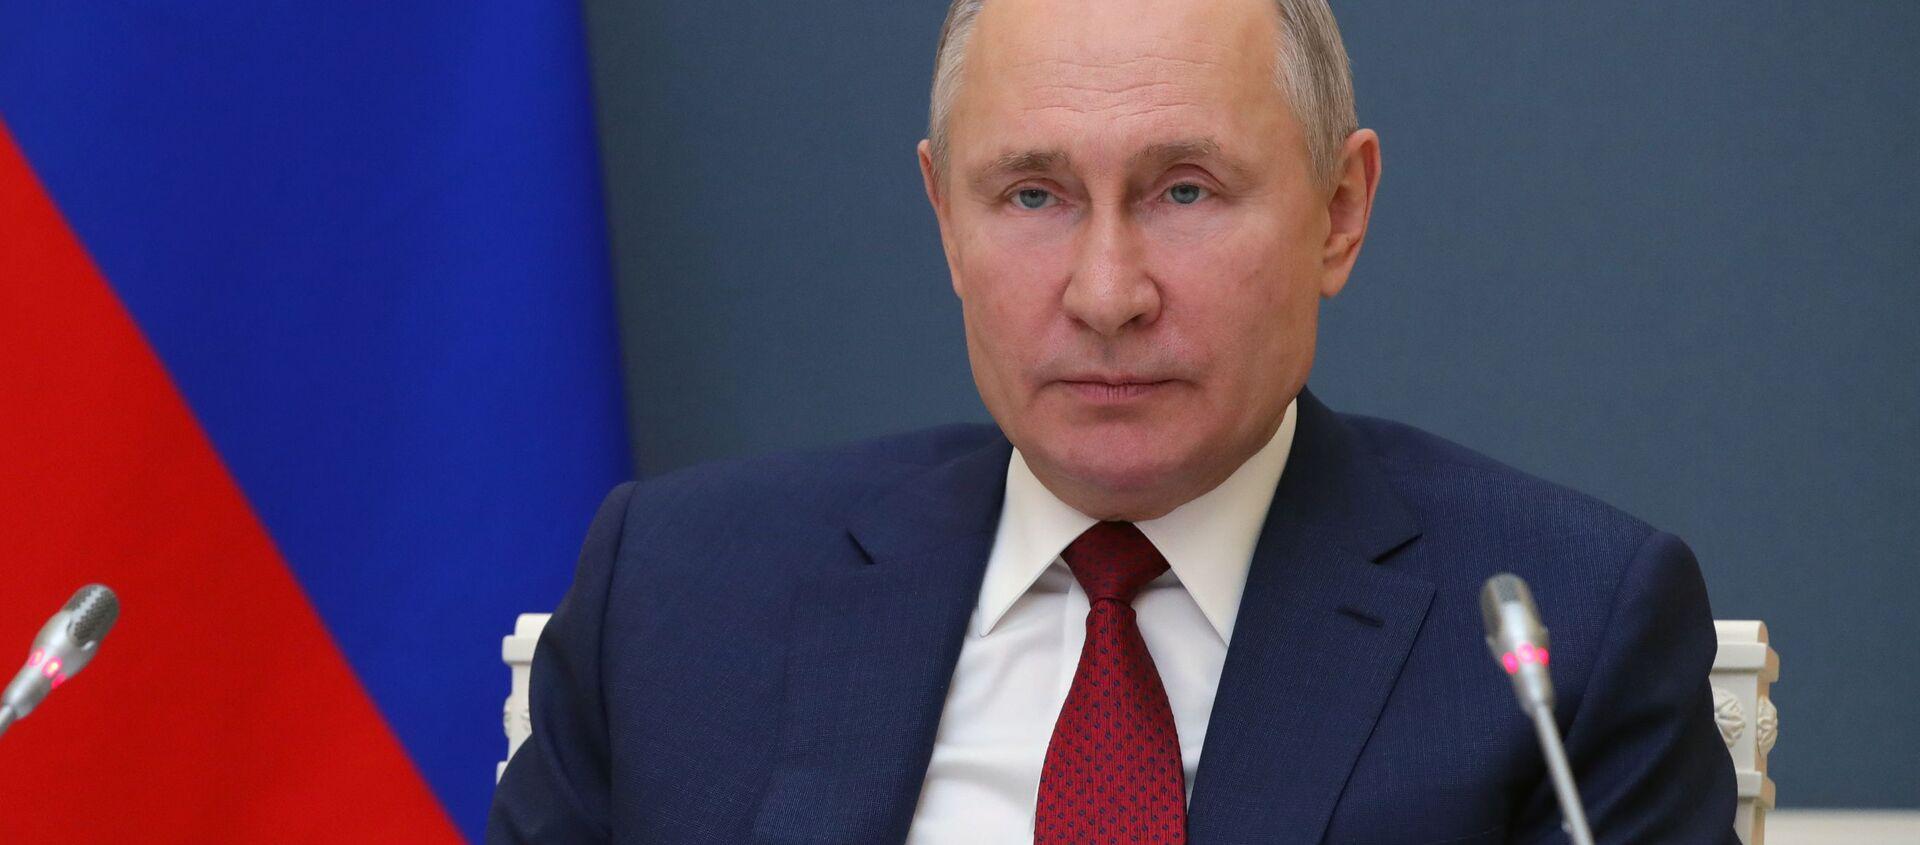 Президент РФ В. Путин выступил на сессии онлайн-форума Давосская повестка дня 2021 - Sputnik Абхазия, 1920, 27.01.2021